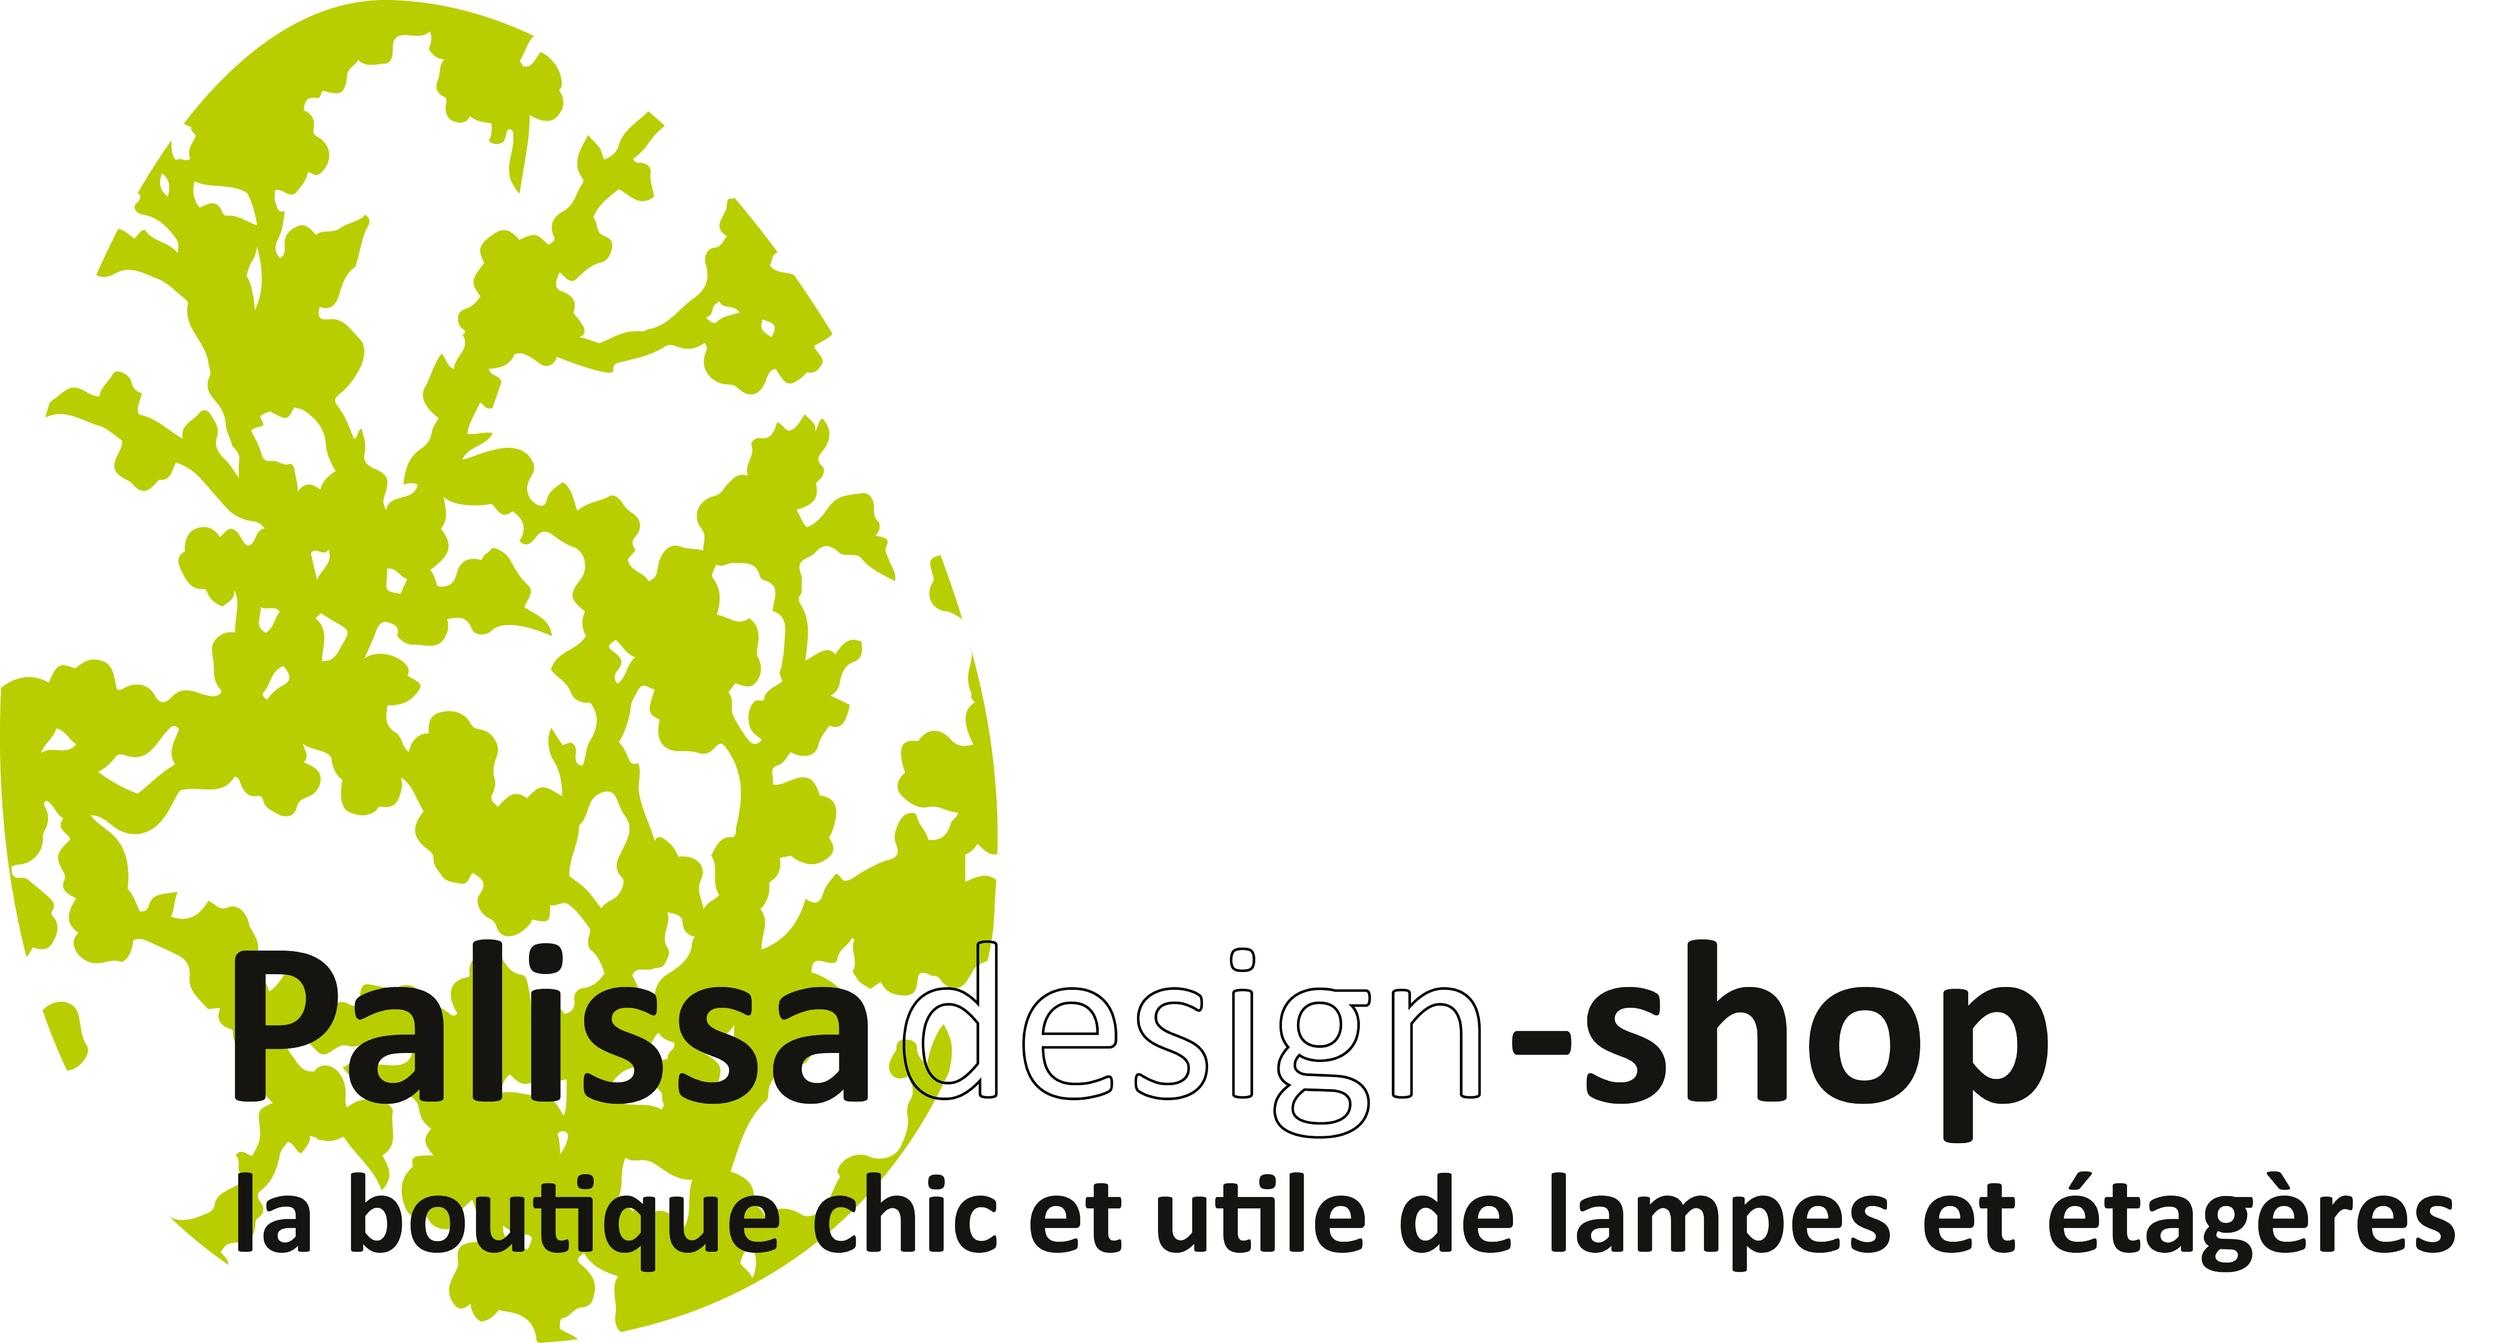 palissadesign-shop